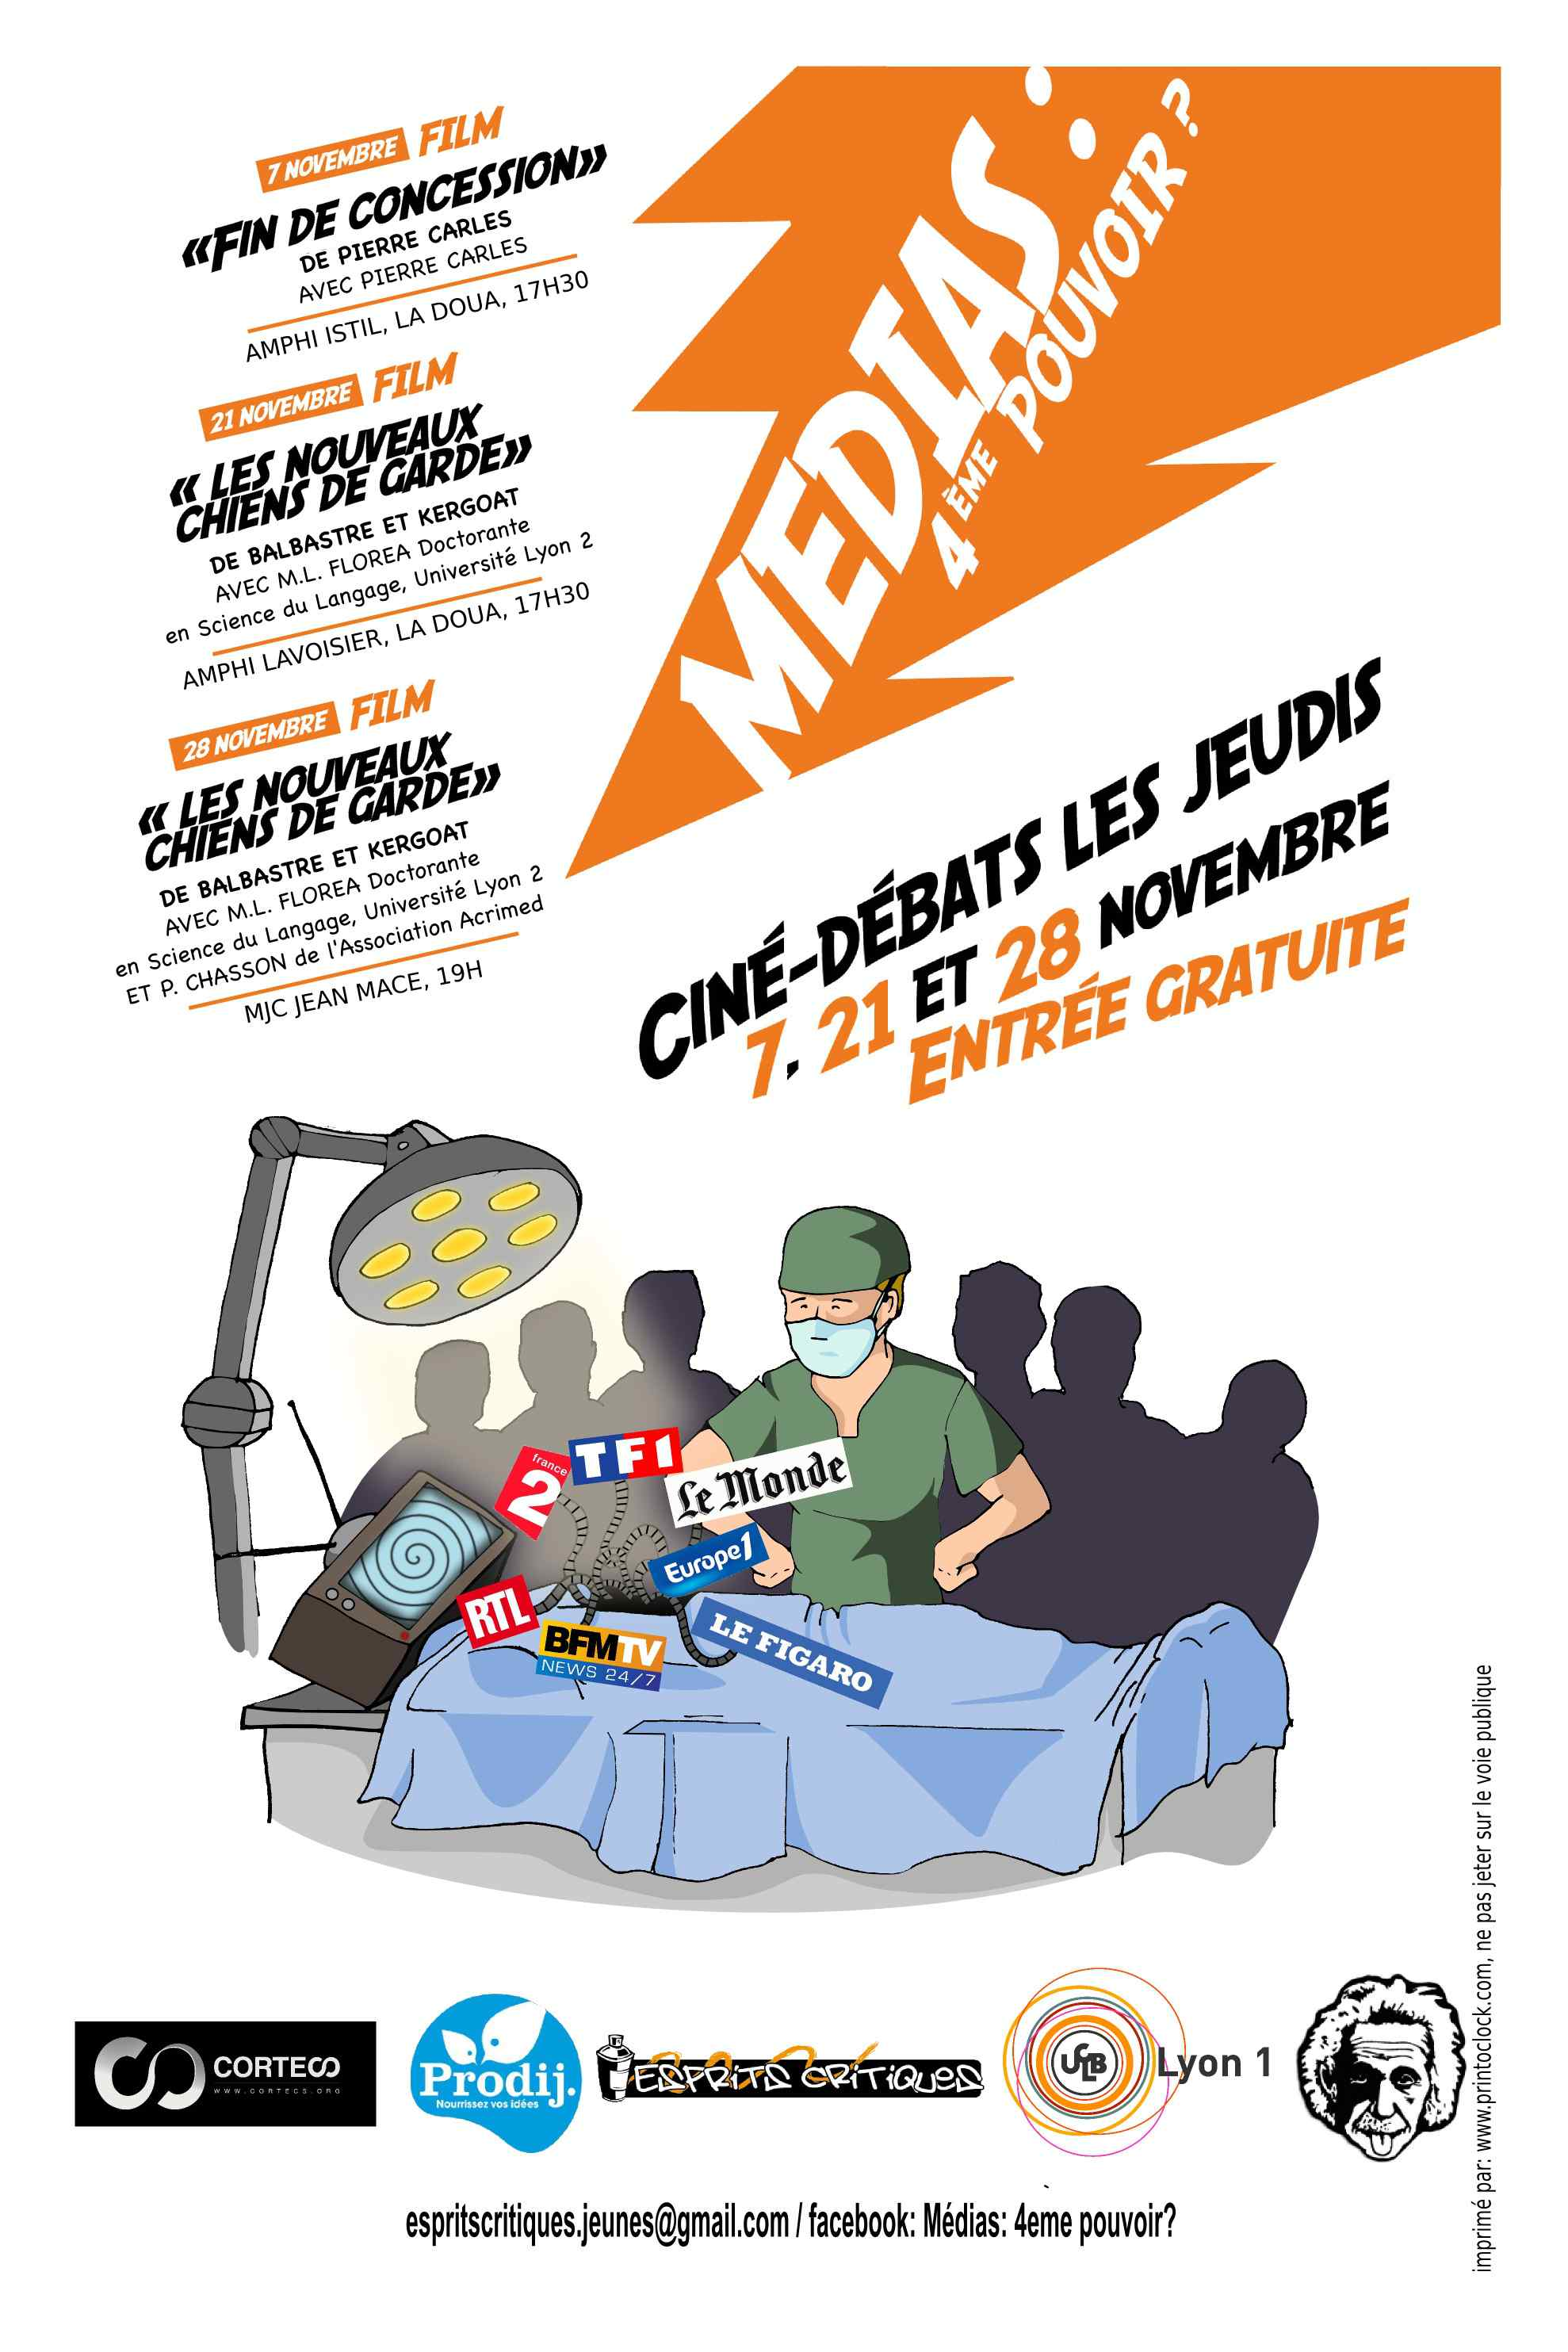 Lyon_Medias4emePouvoir_red